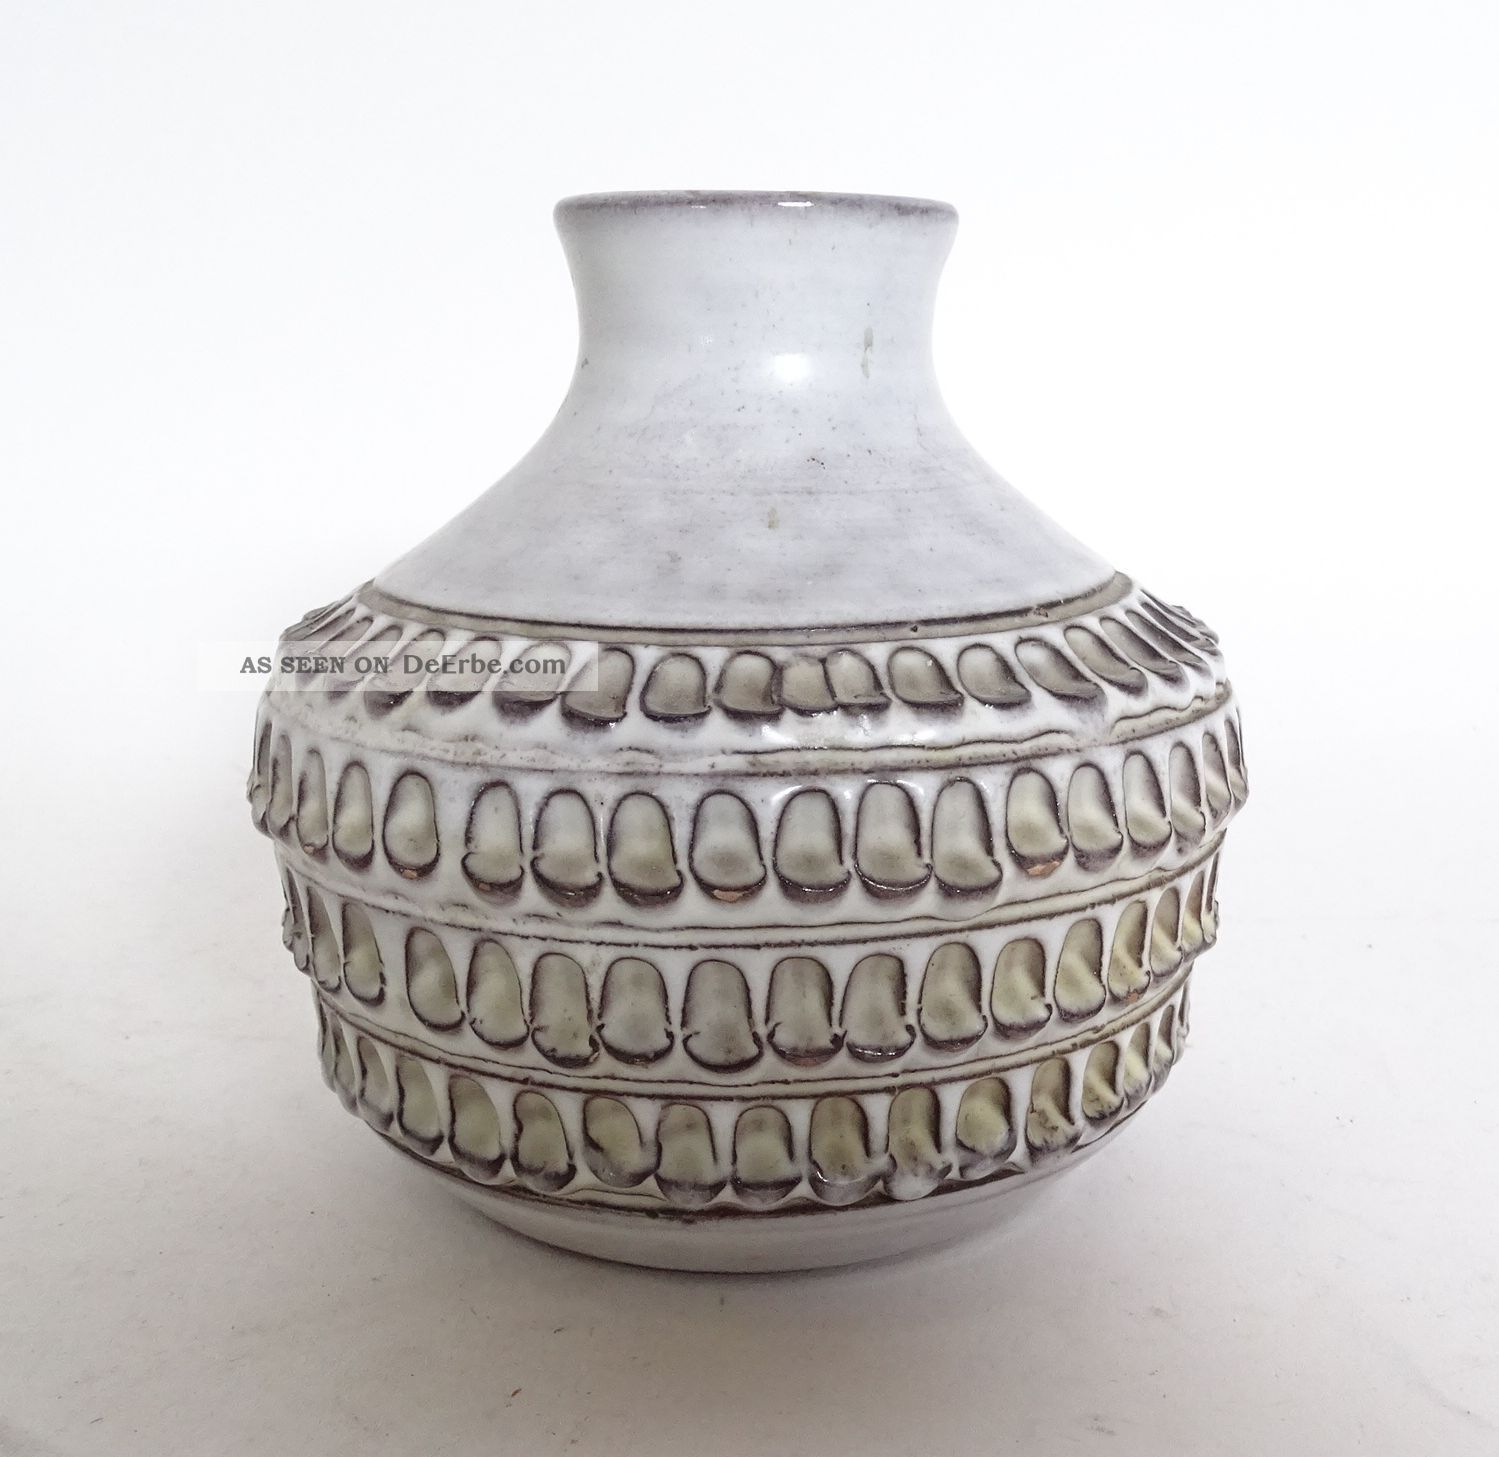 Handgearbeitete Studio Design Keramik Vase Signiert F.  S.  Nr.  855/12 1960-1969 Bild